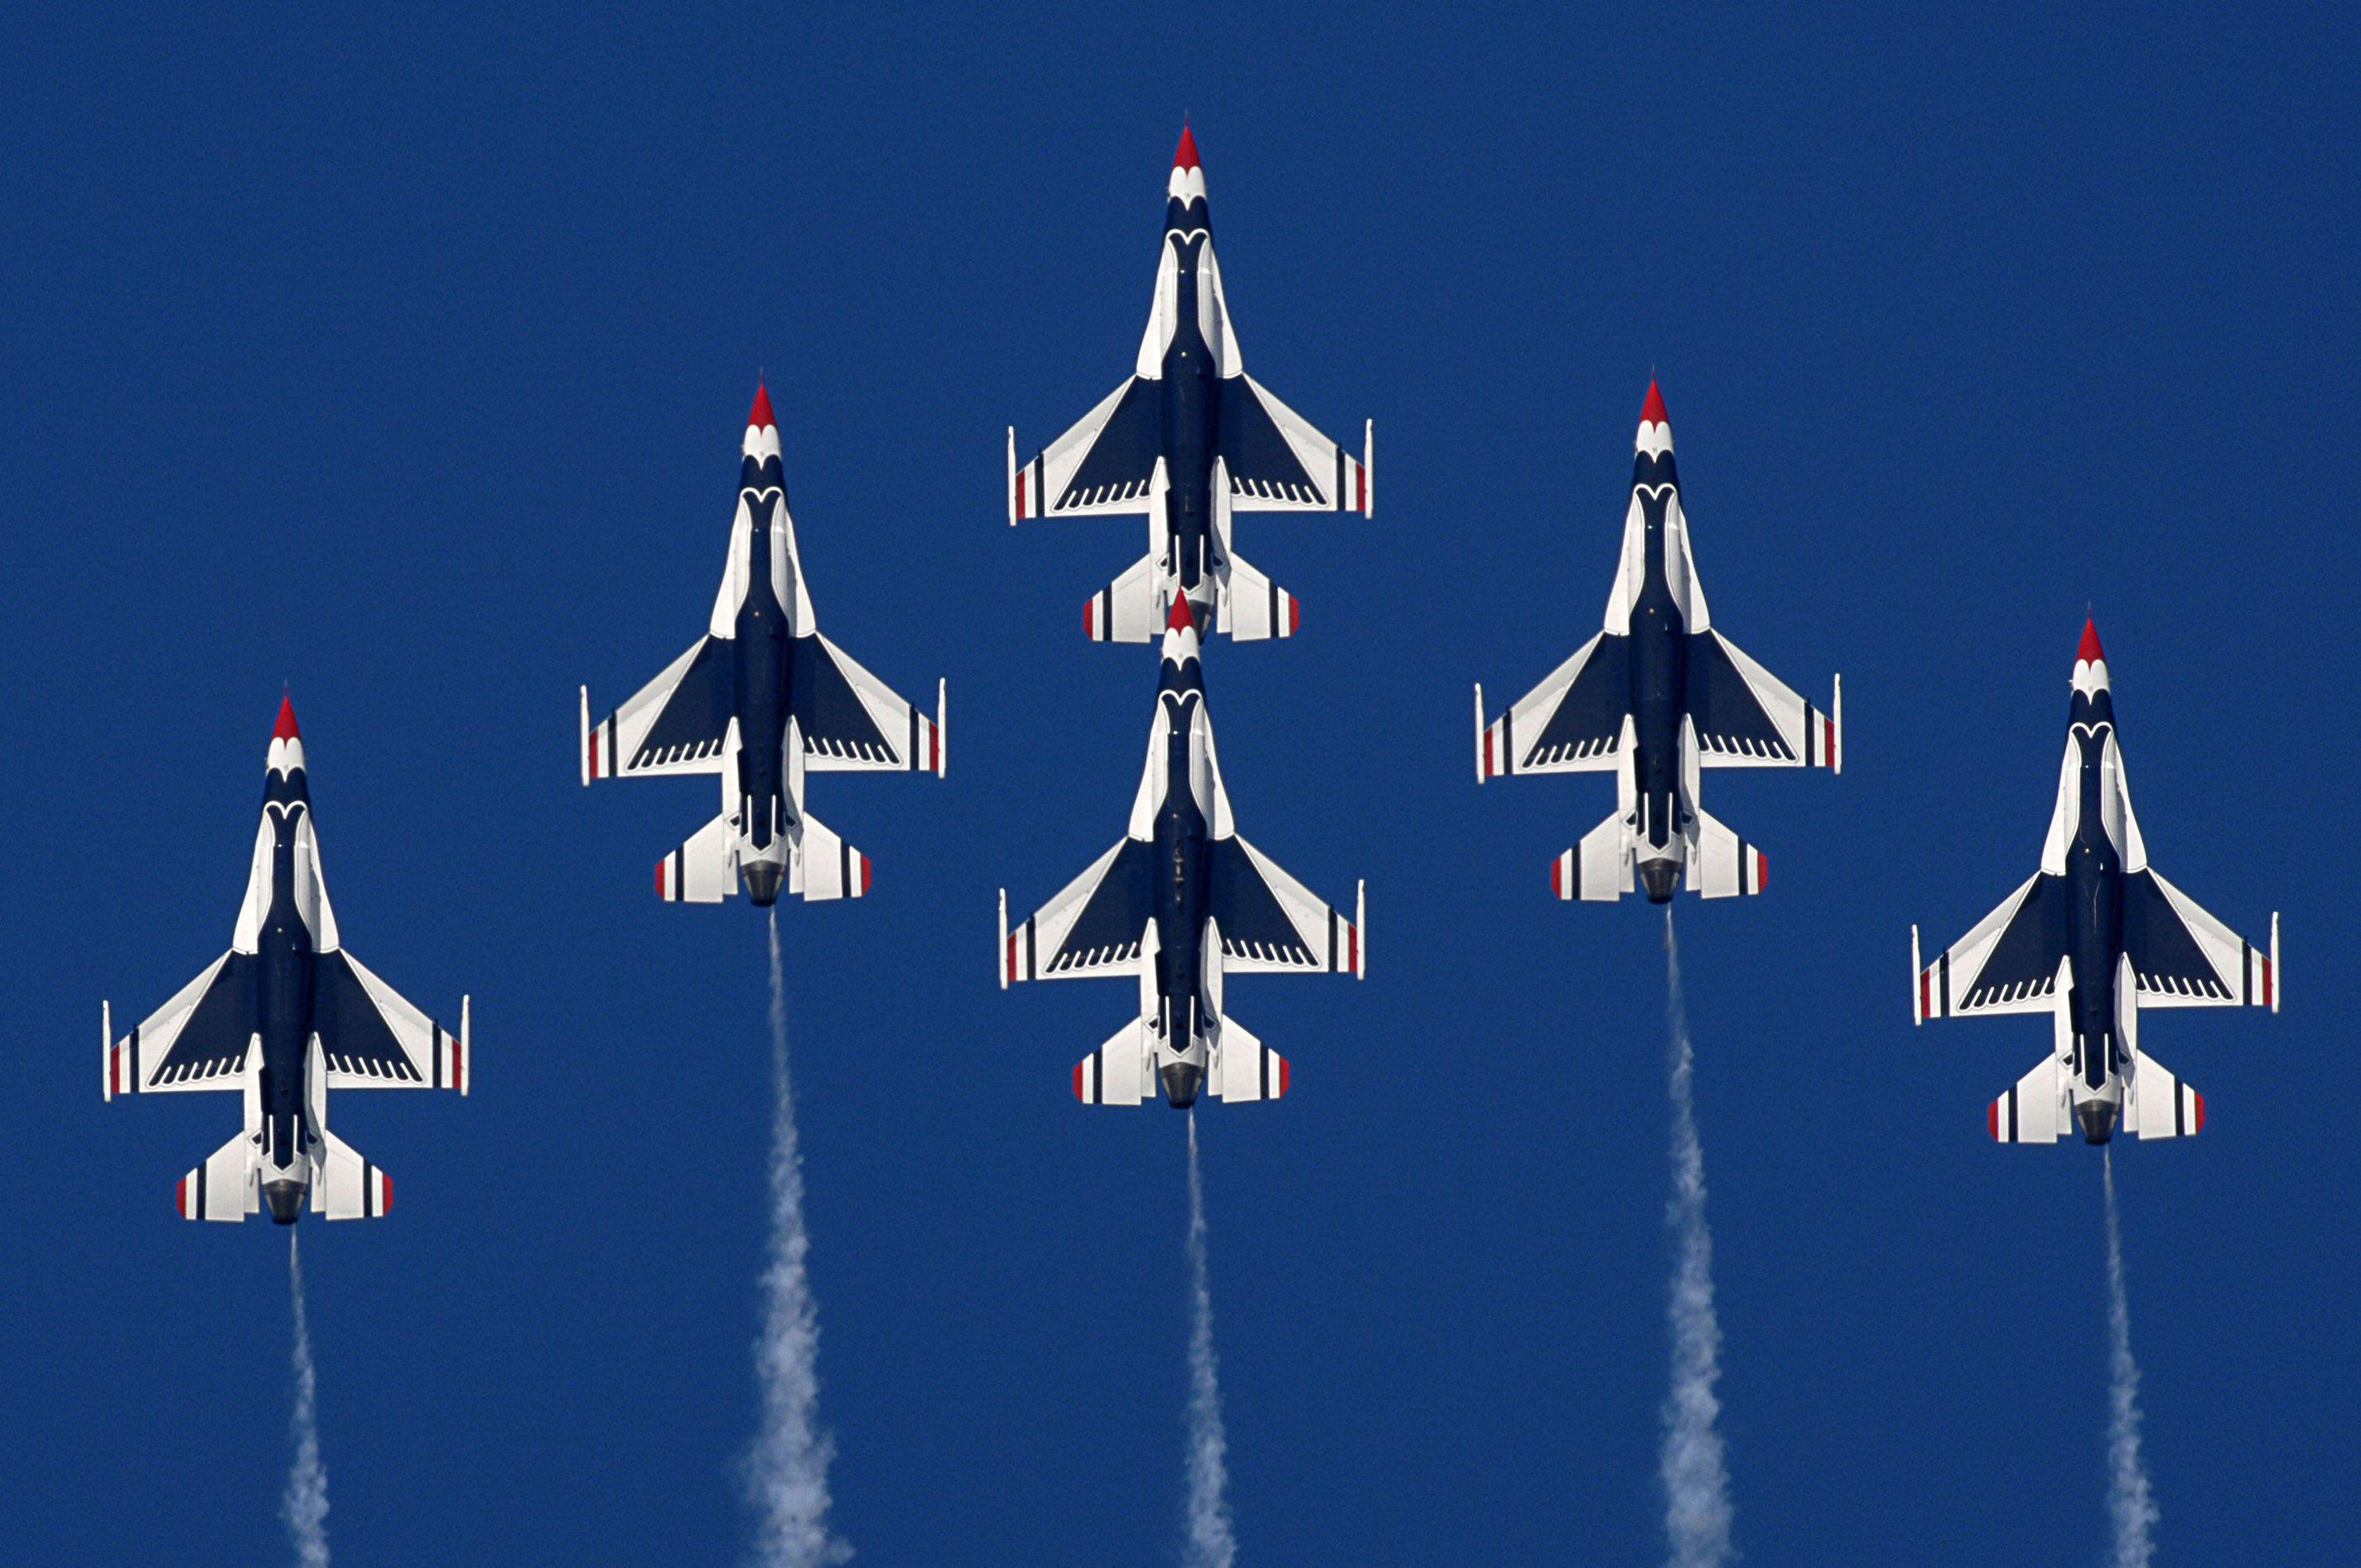 Warplanes Illustrated Air Force Wallpaper Usaf Thunderbirds Air Show